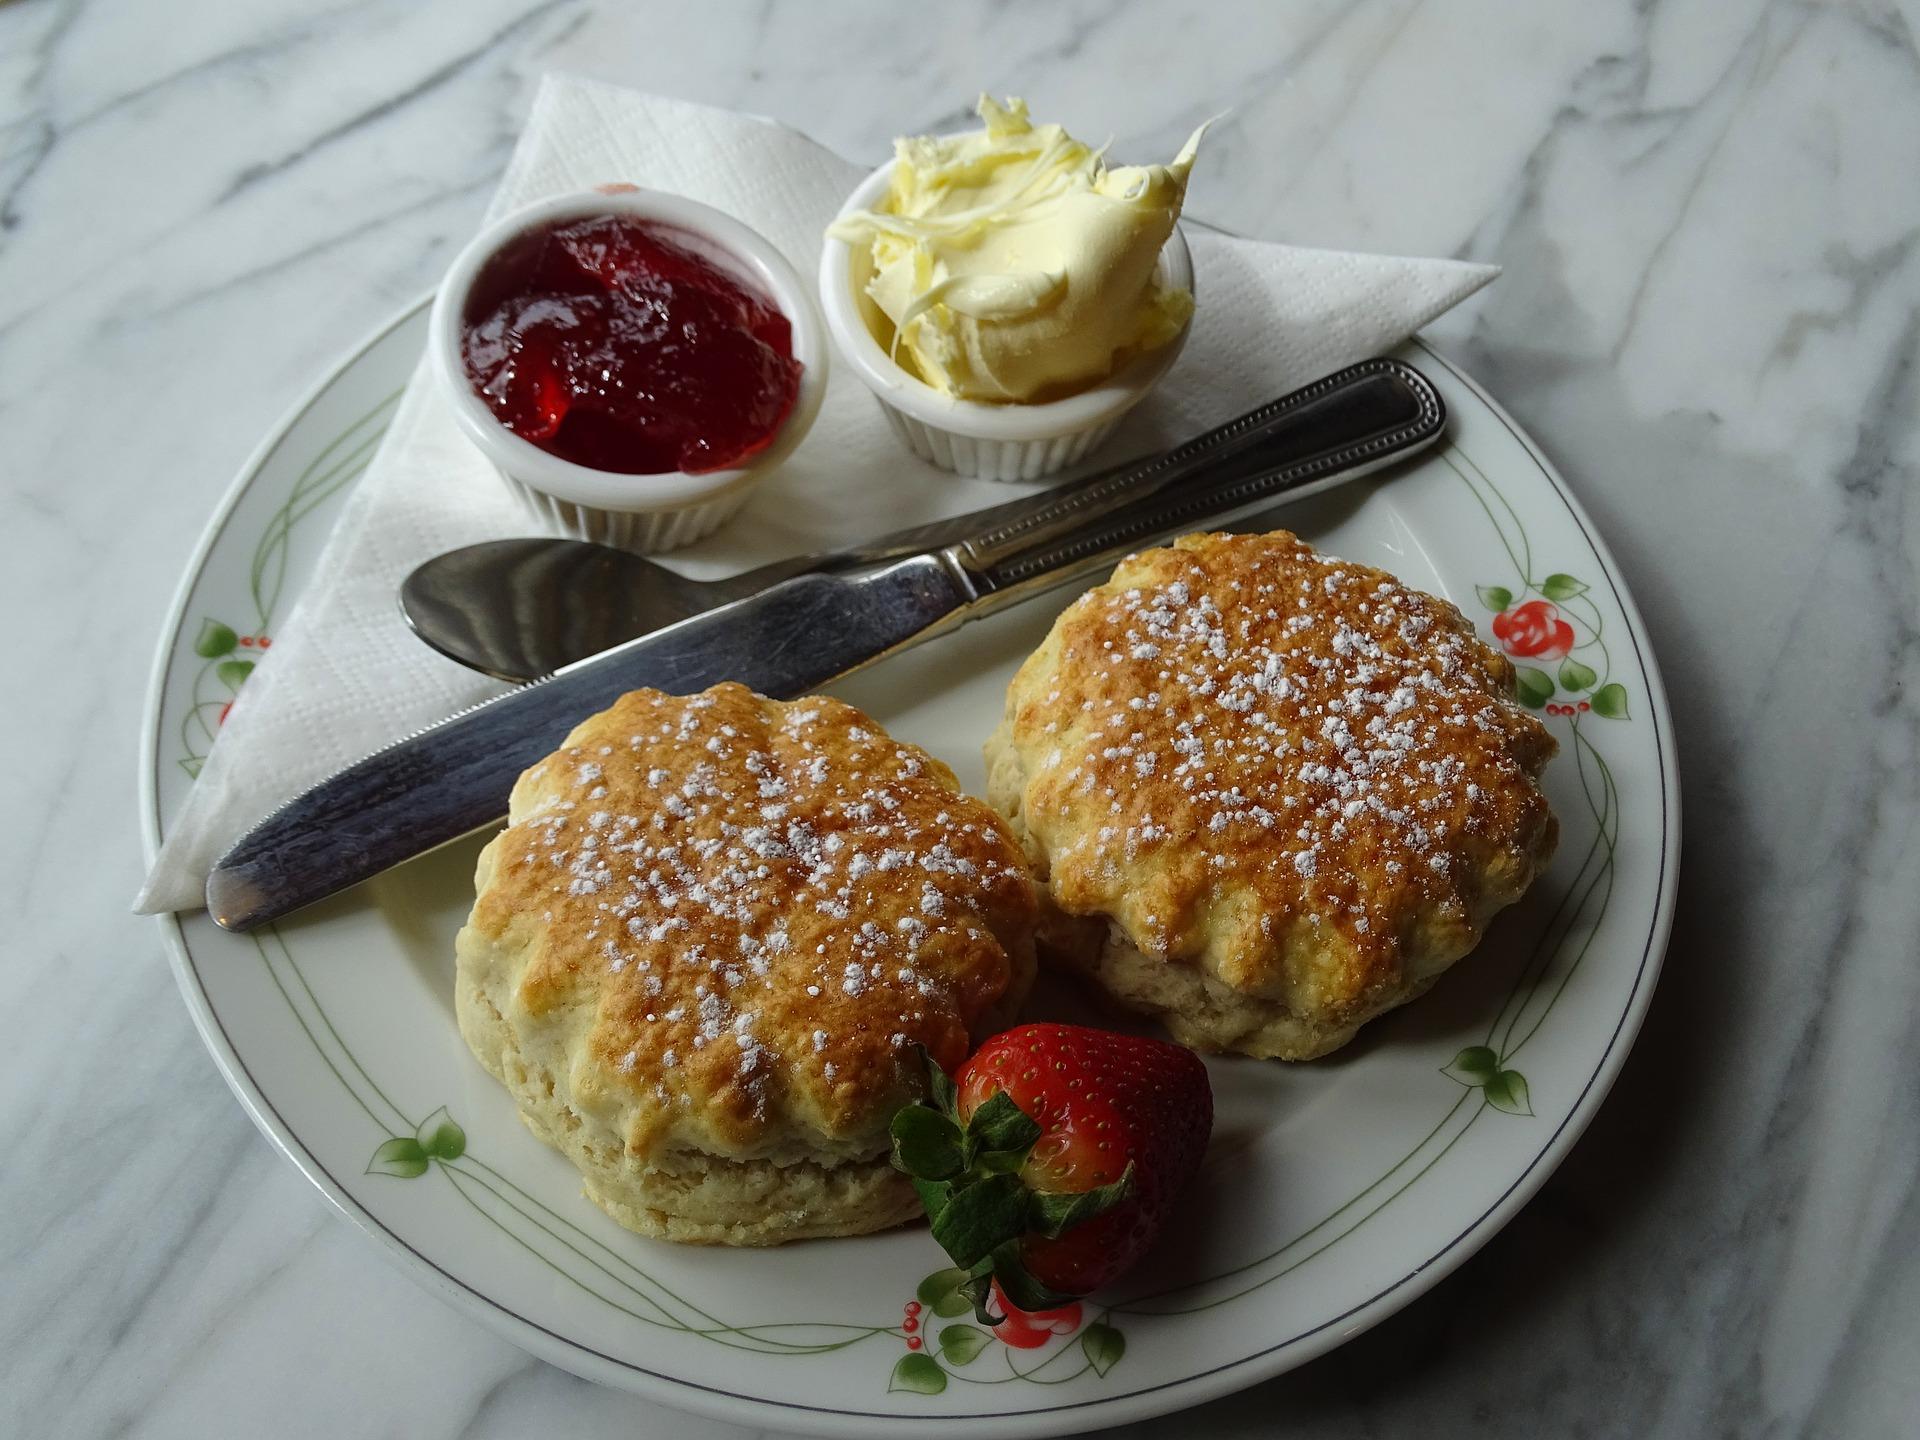 Enjoy a cream tea on the Bodmin and Wenford Railway